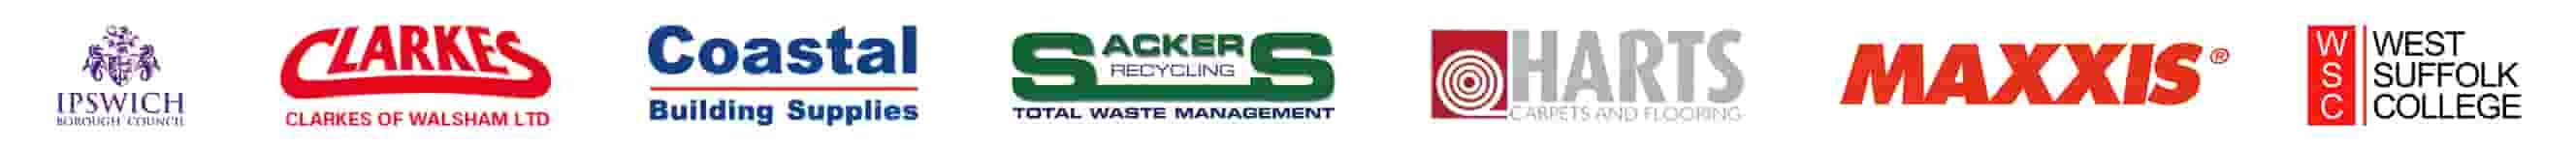 Armafone business customer logos